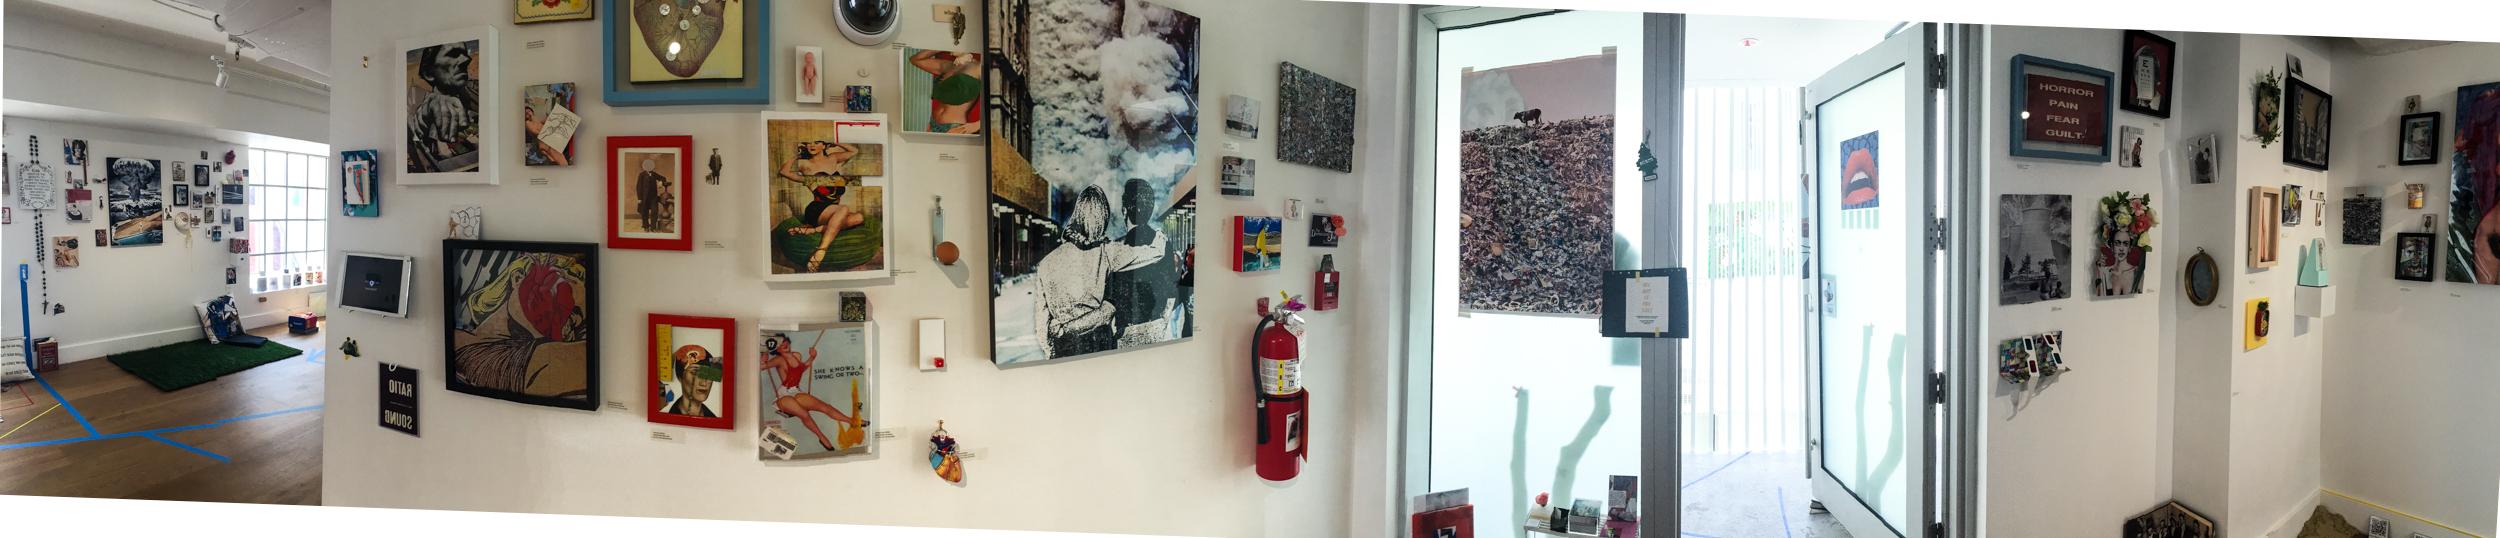 Faena-Exhibition-Images-135.jpg